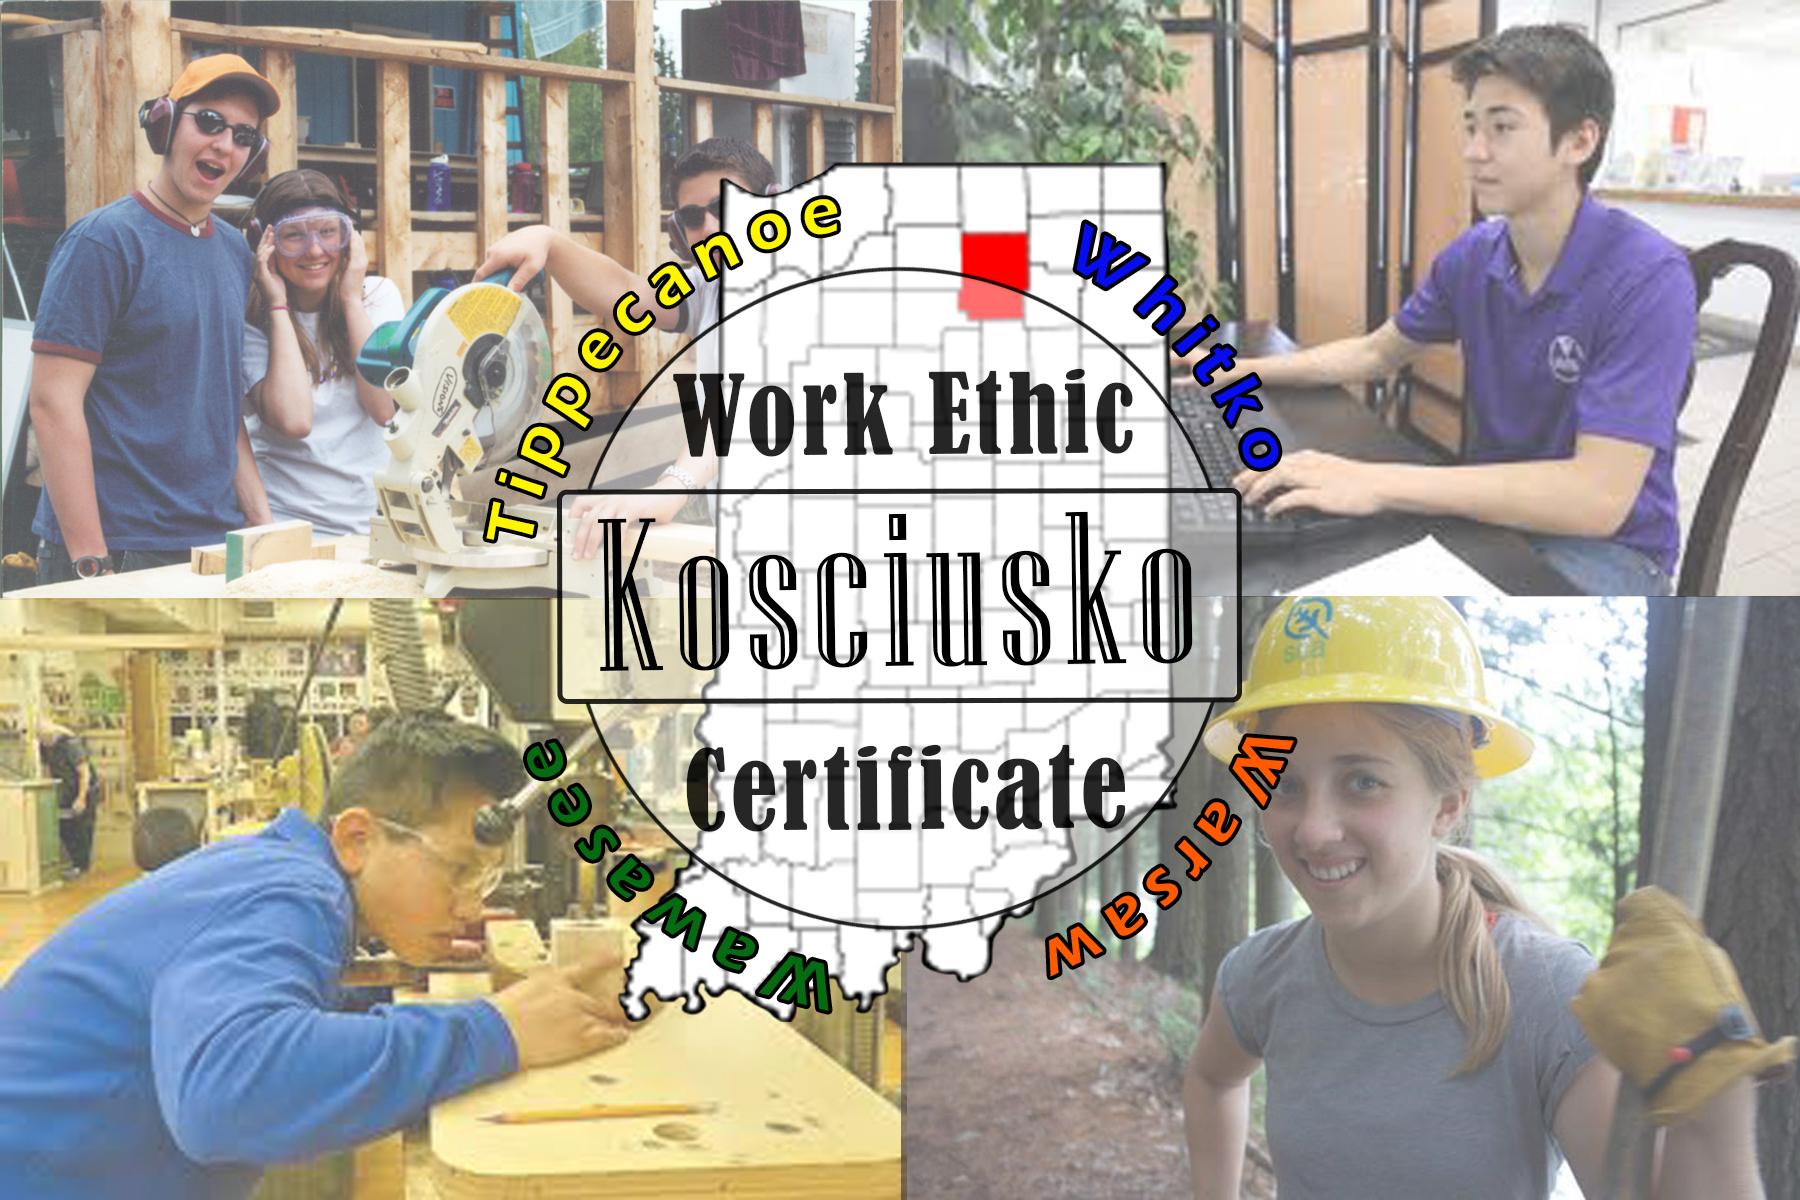 Work Ethic Kosciusko Cetificate